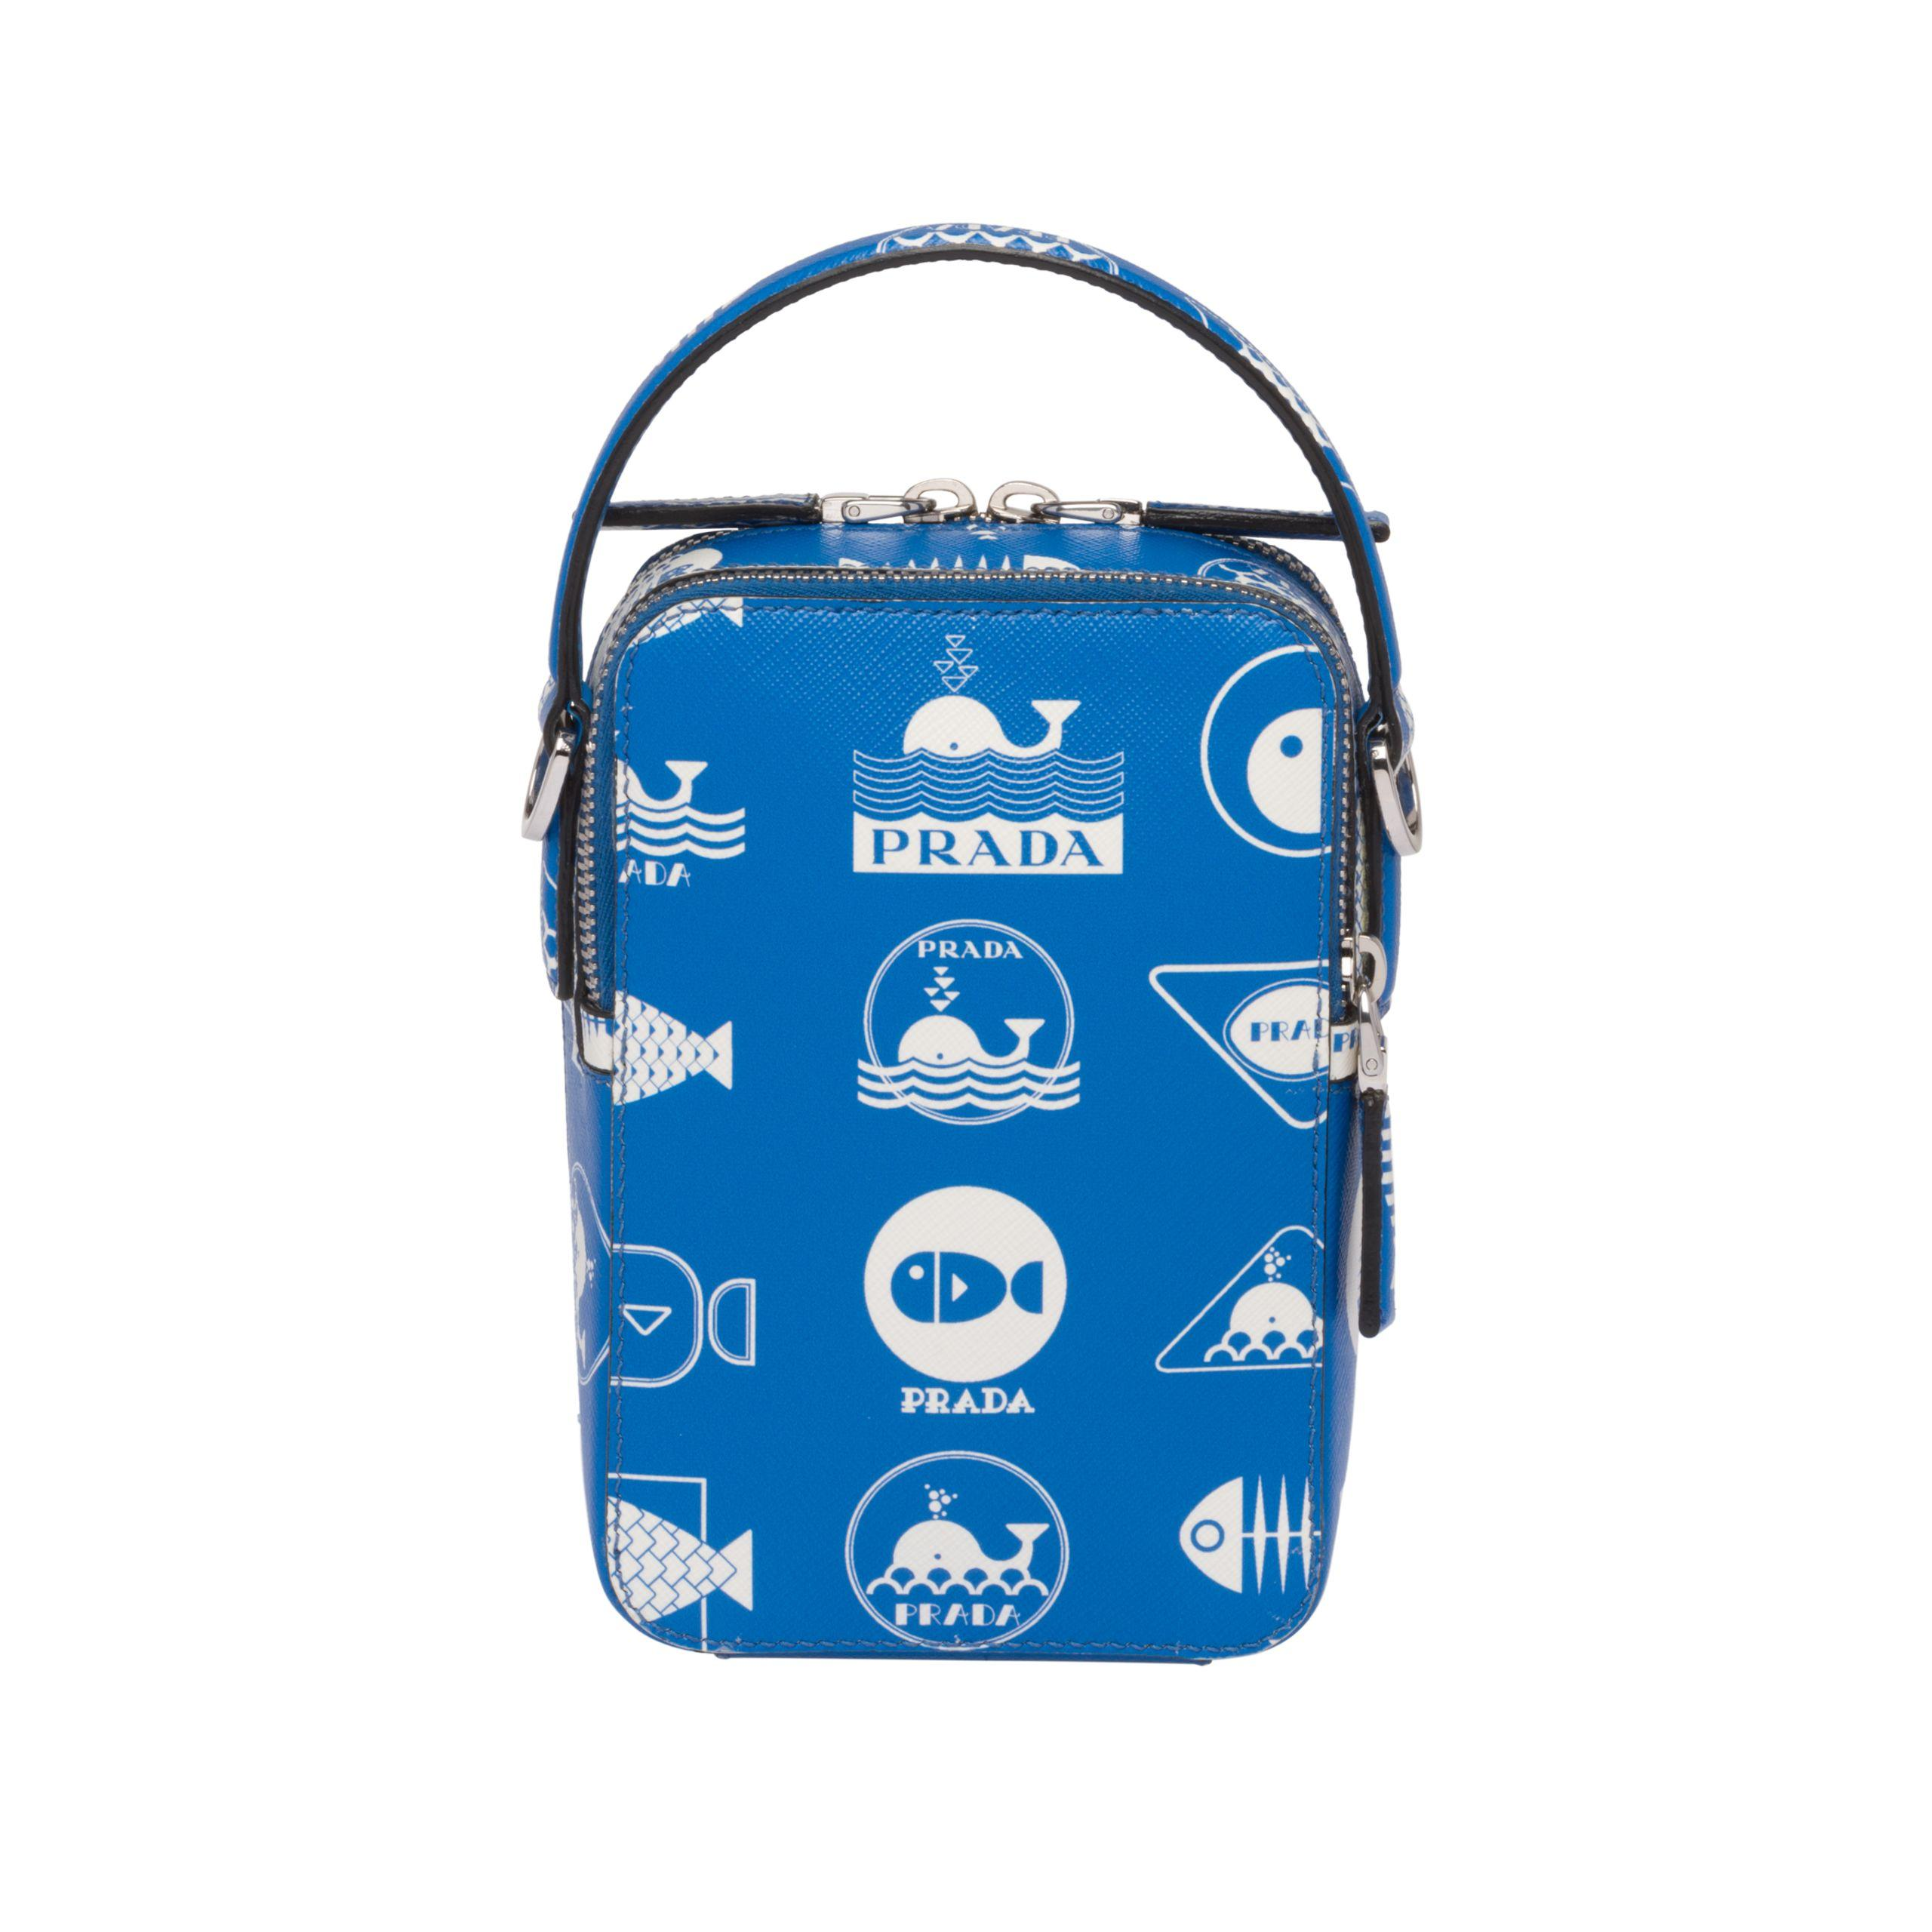 5a0407ef22fd Prada - Blue Brique Saffiano Leather Bag for Men - Lyst. View fullscreen